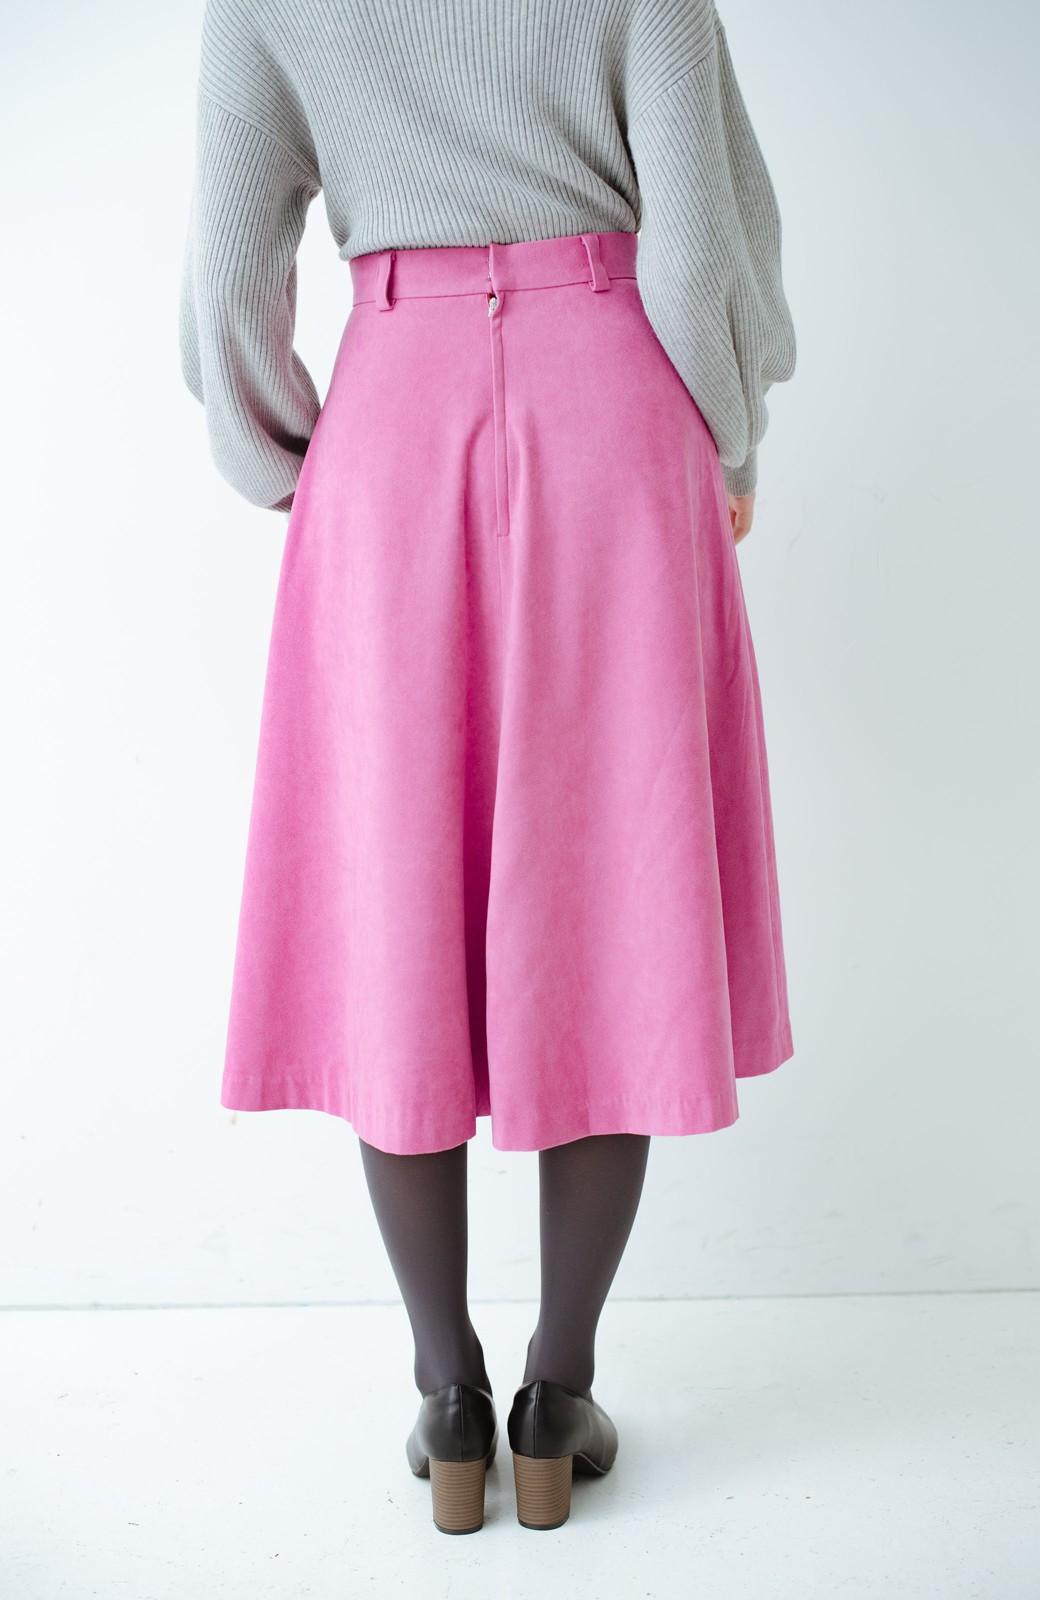 haco! 女っぽく上品に見える フレアースカート by que made me <ピンク>の商品写真4